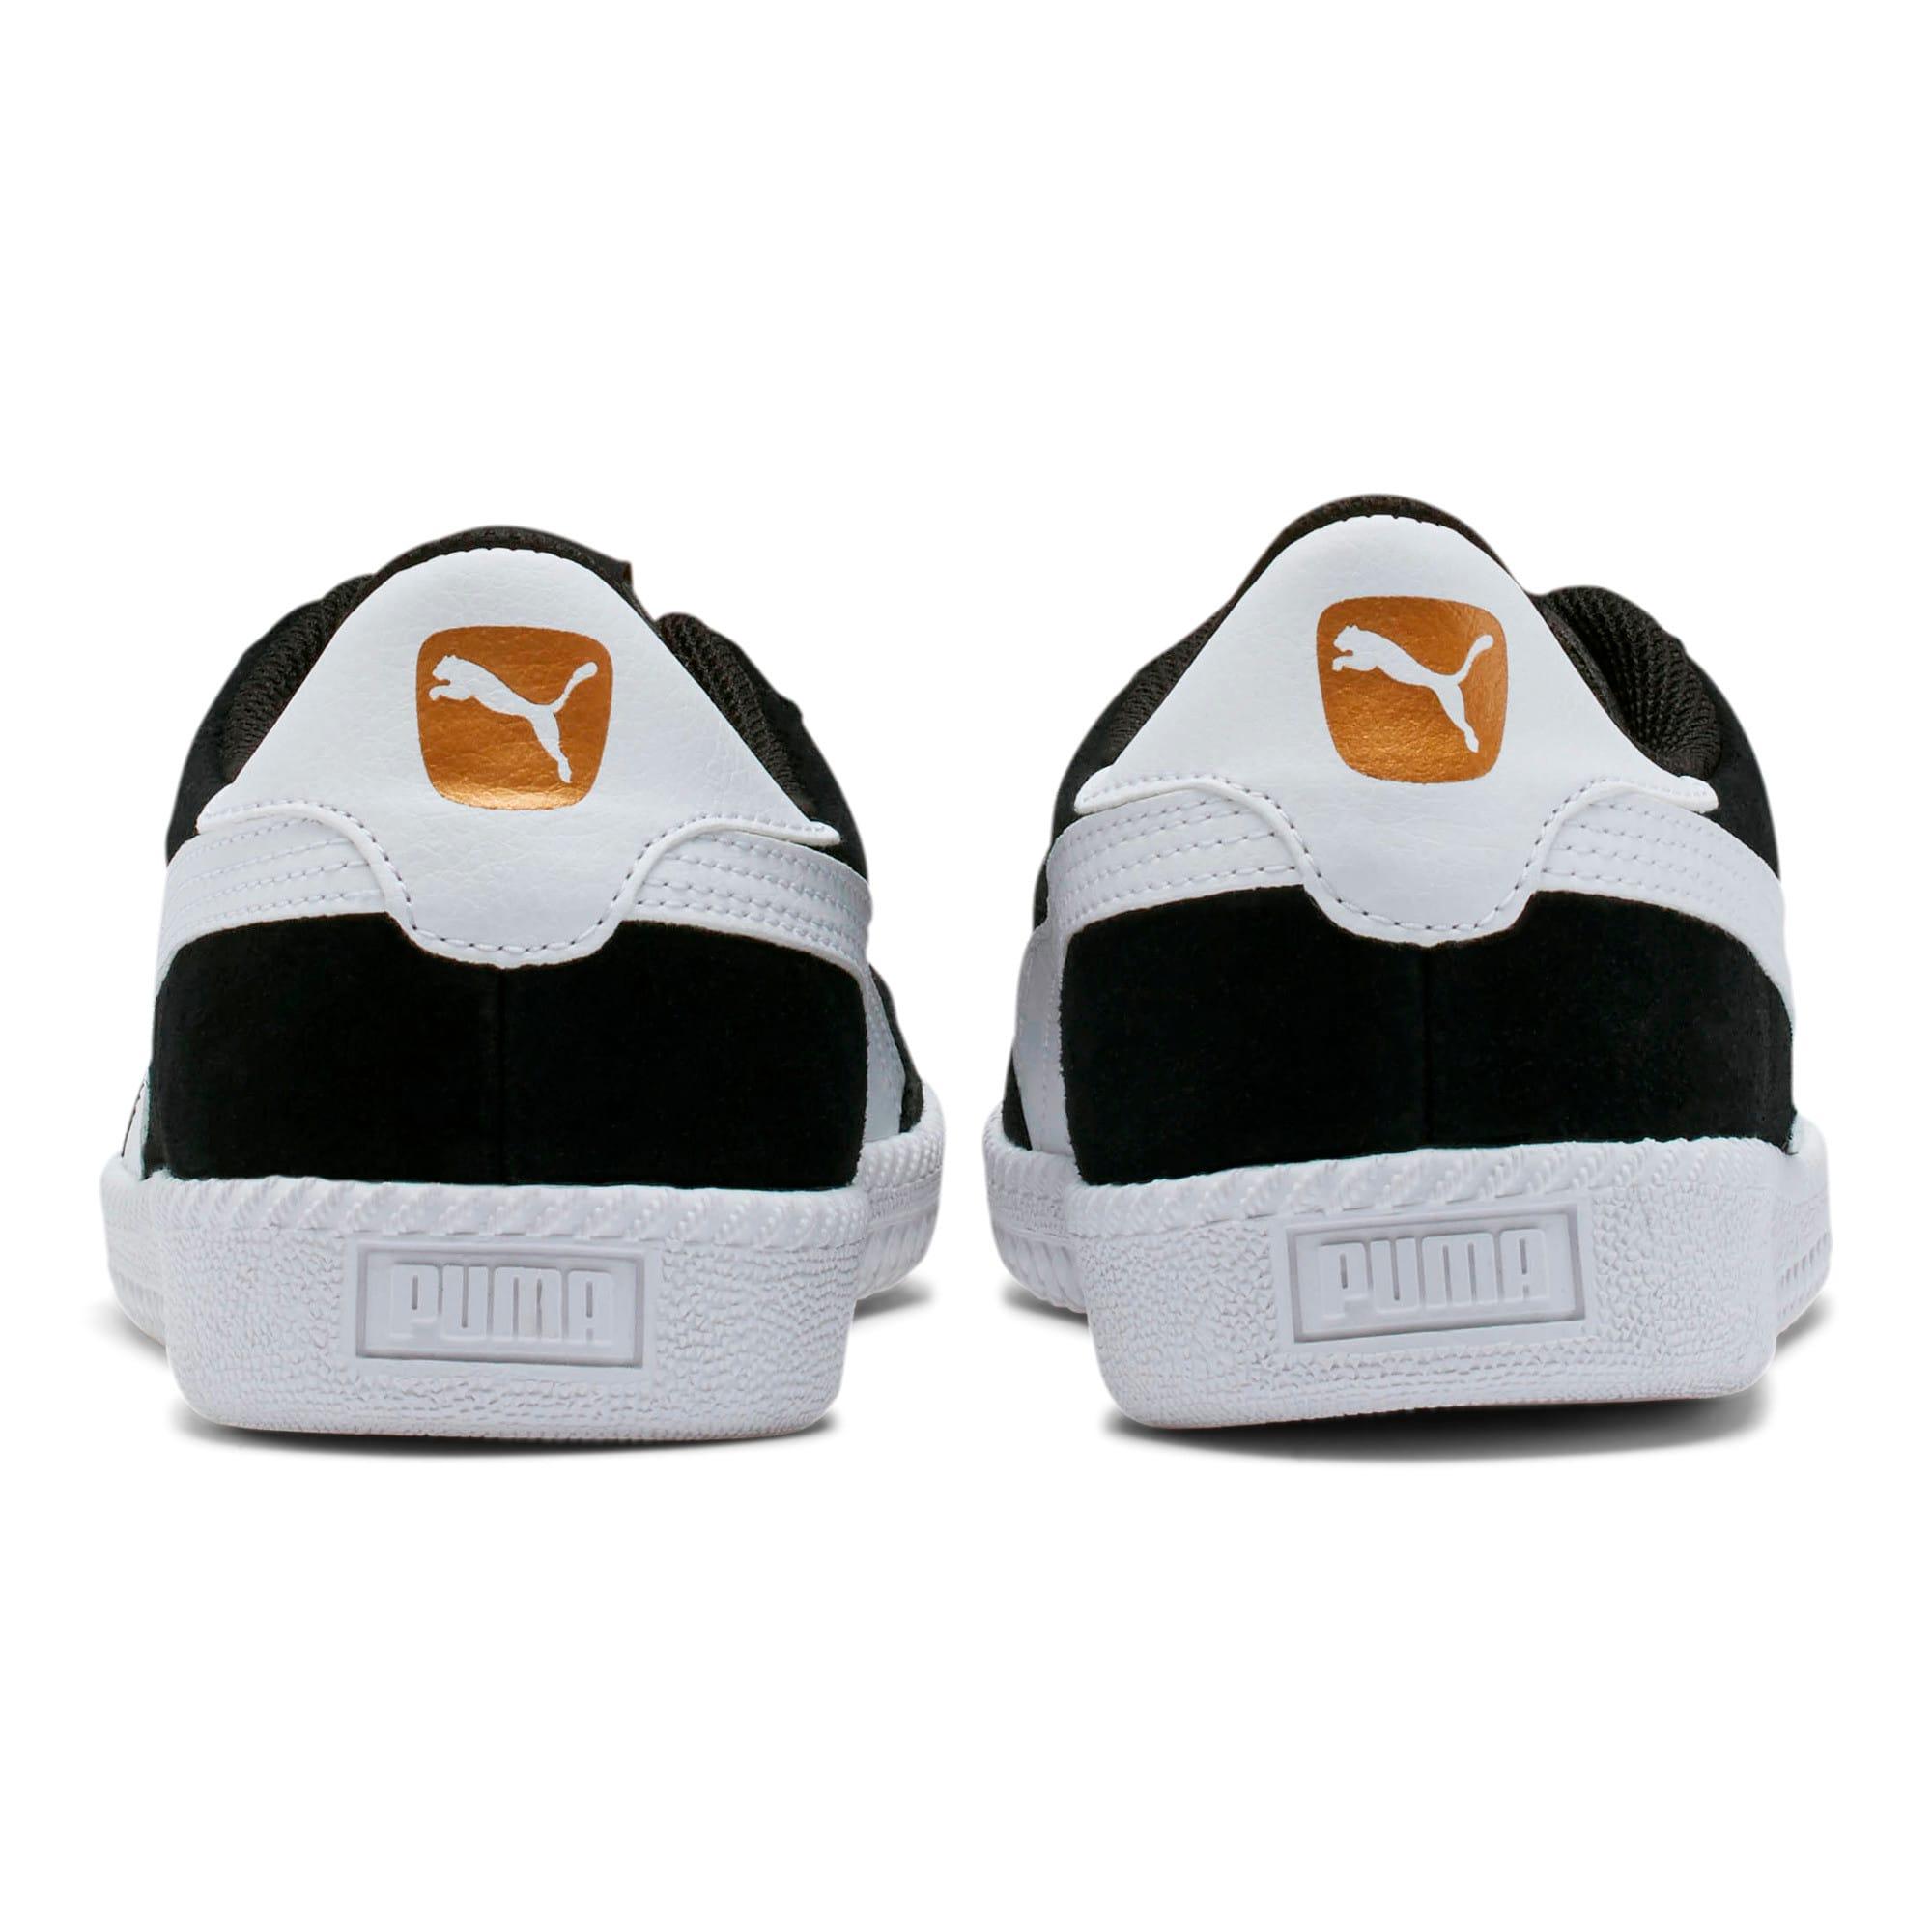 Thumbnail 4 of Astro Cup Suede Sneakers, Puma Black-Puma White, medium